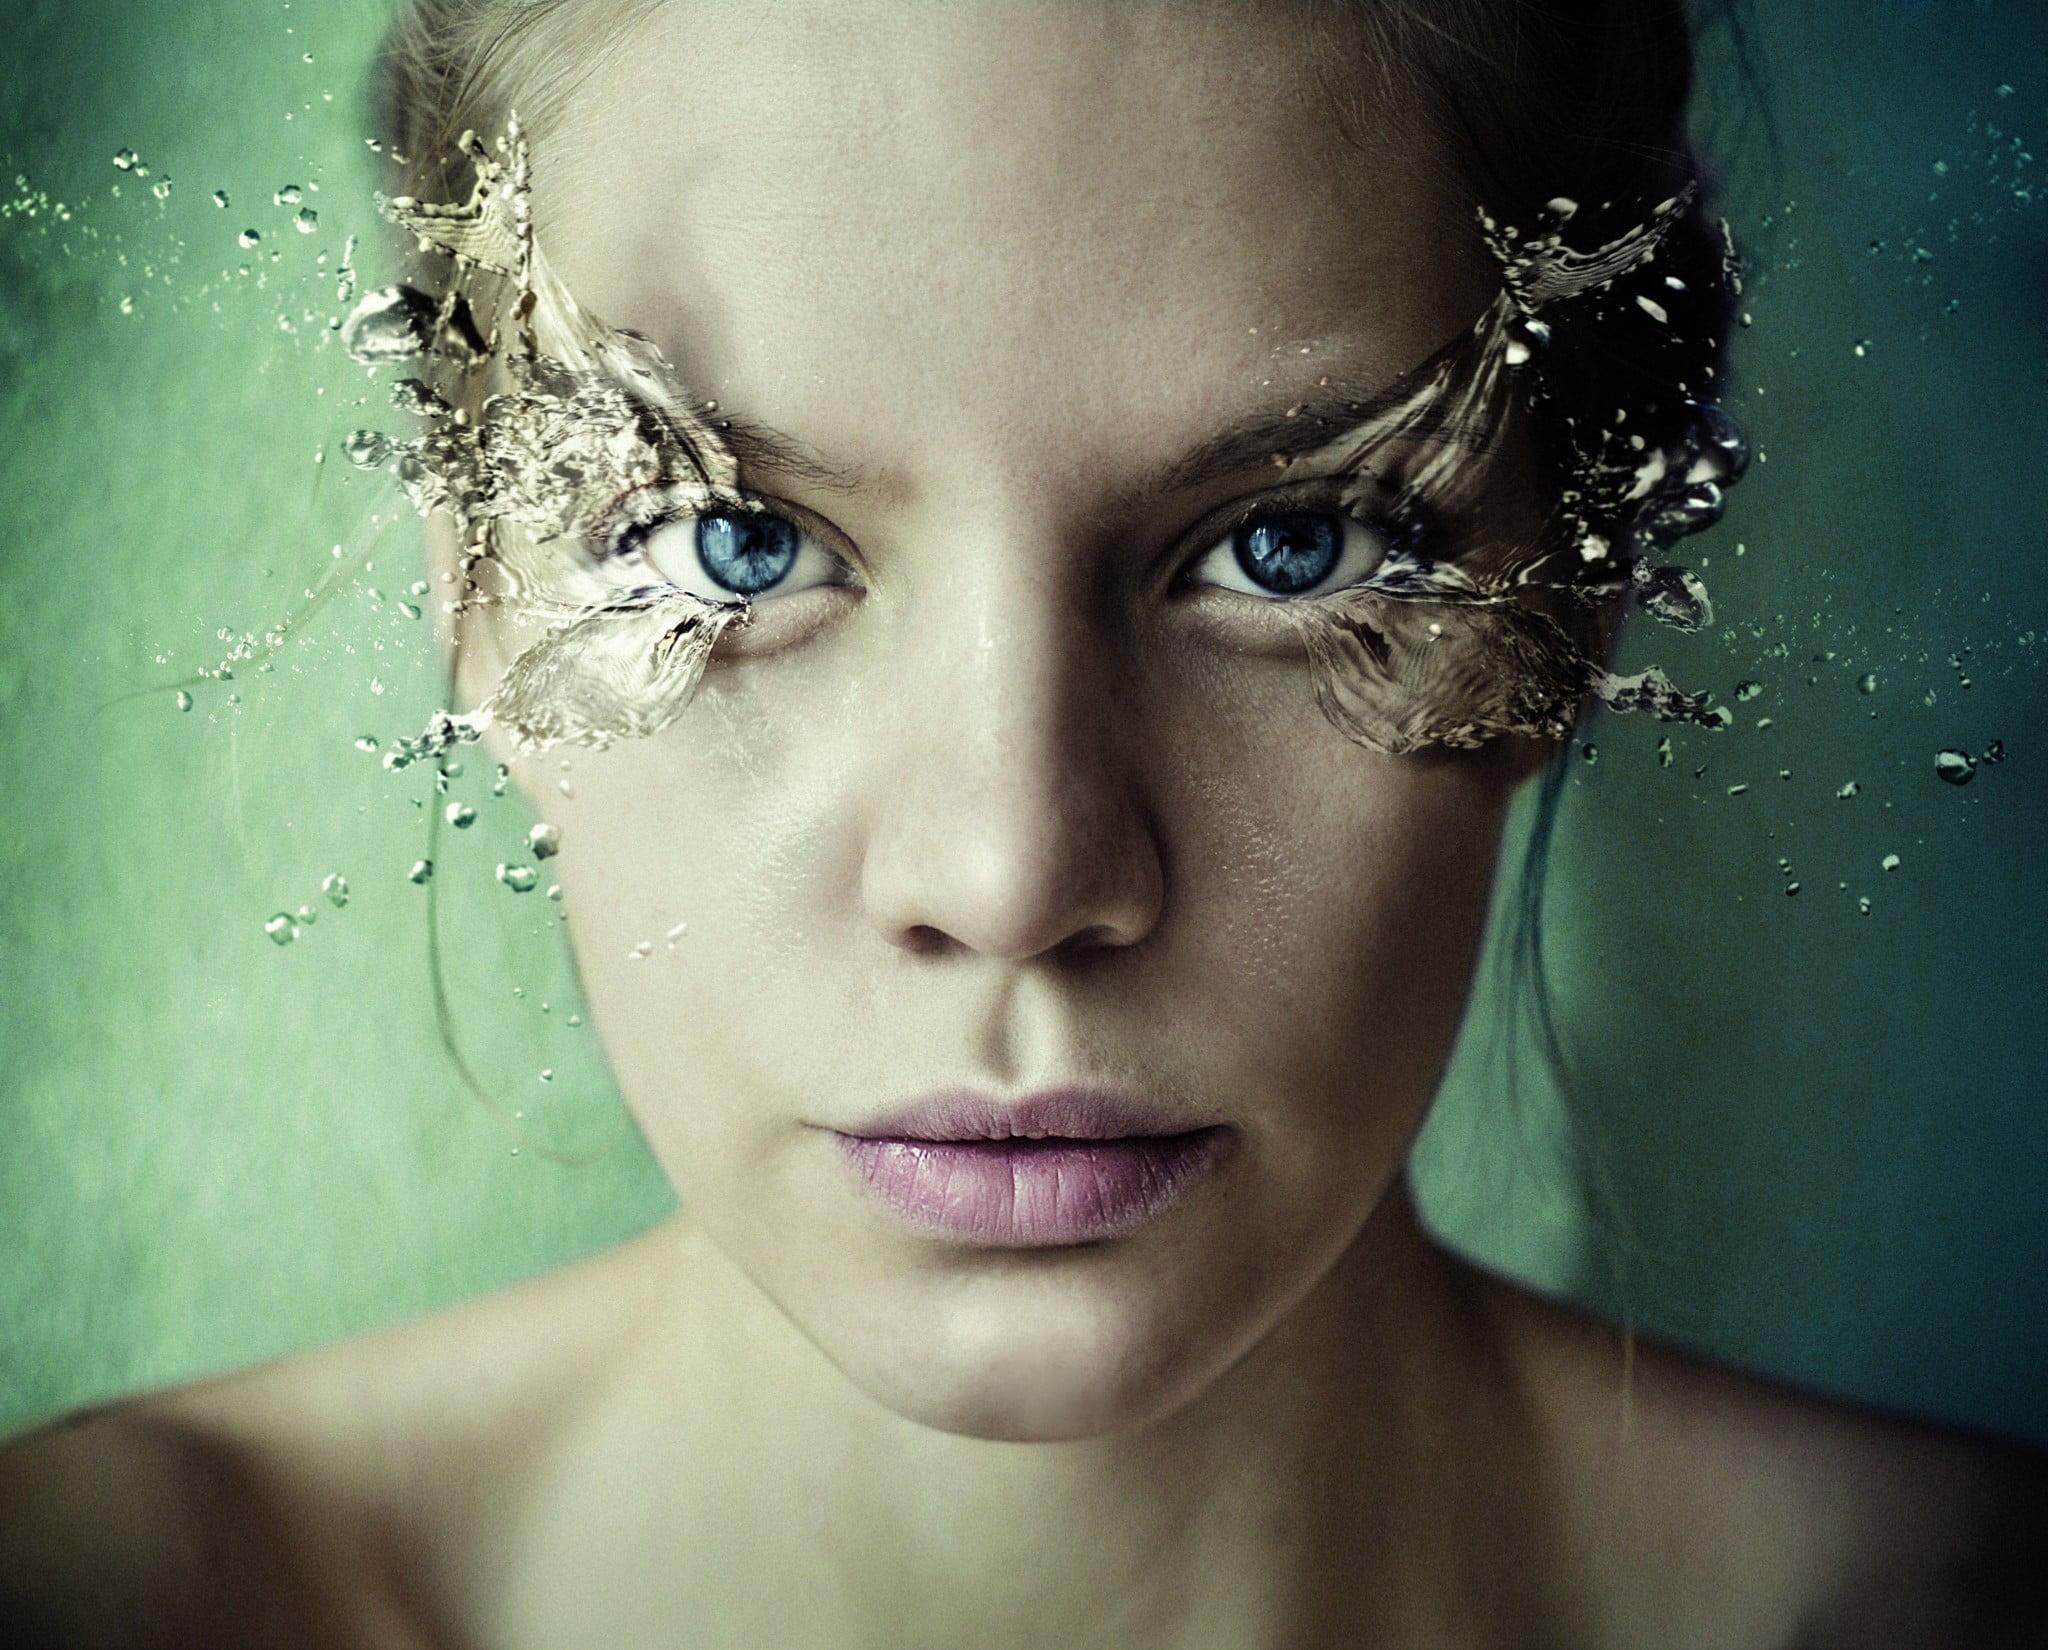 AFT pharmaceuticals eye care: woman with splash eyes